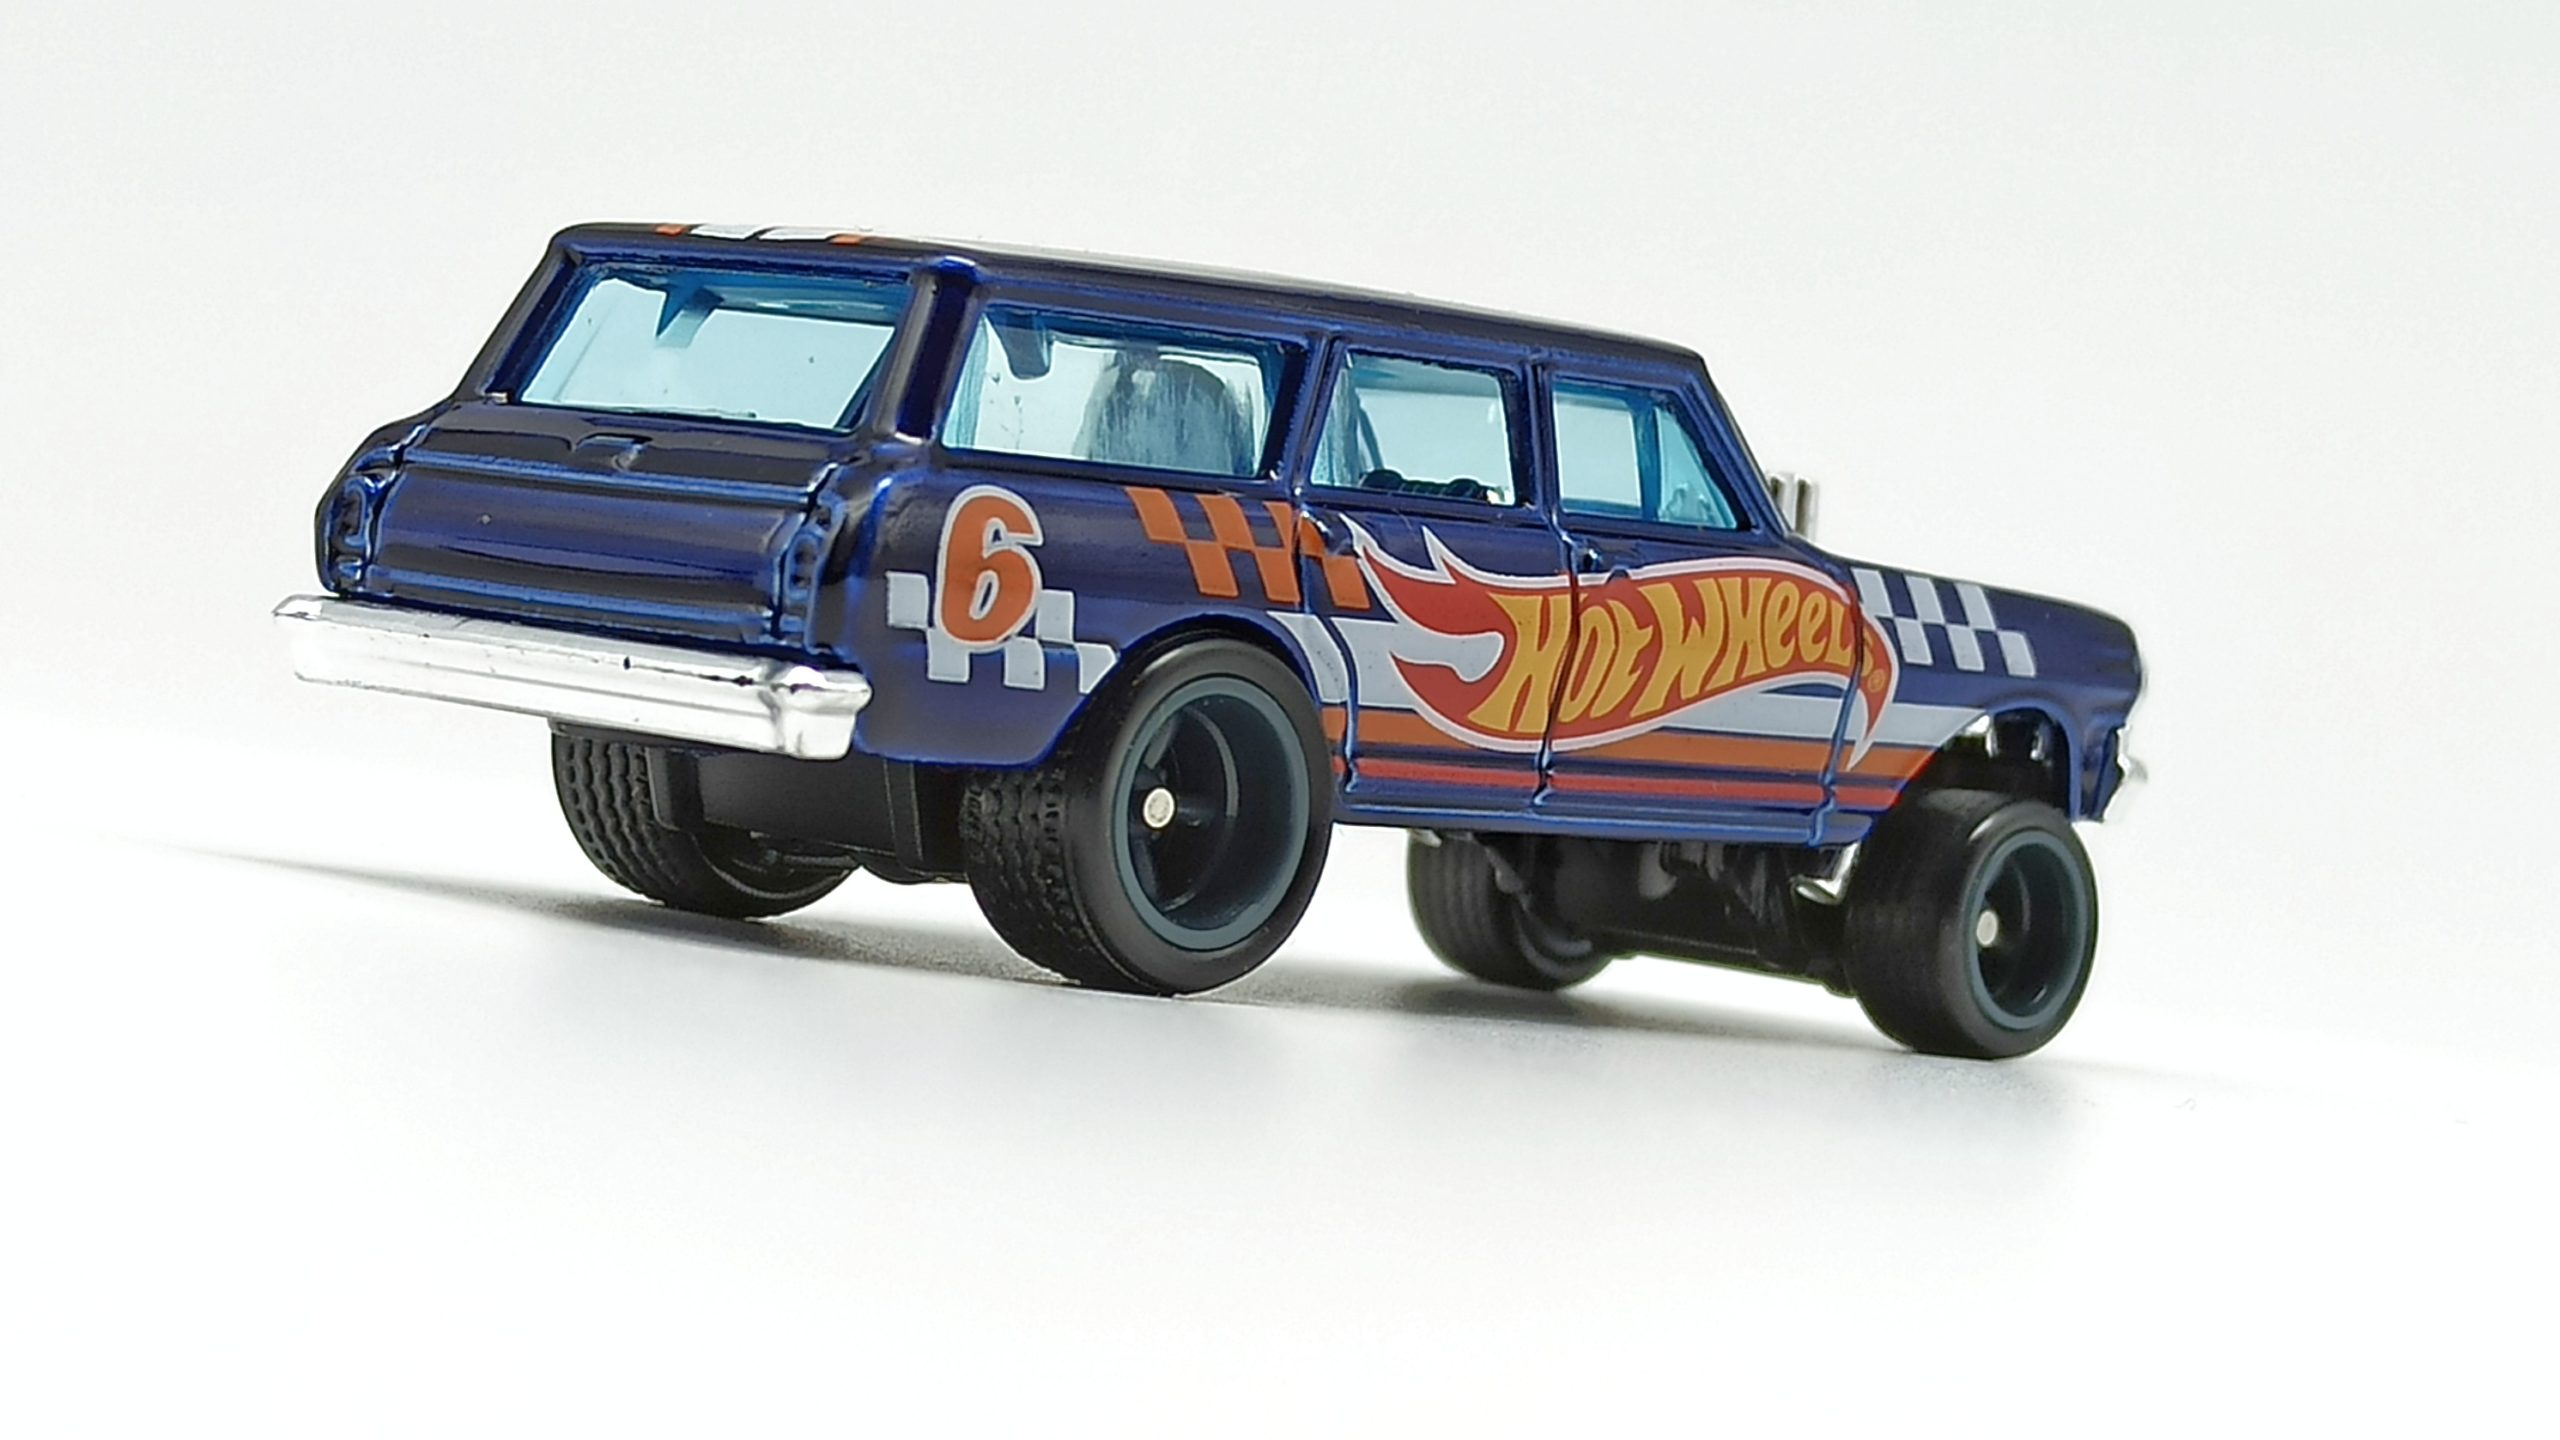 Hot Wheels '64 Chevy Nova Wagon Gasser (GTD06) 2021 (232/250) HW Race Team (7/10) spectraflame blue Super Treasure Hunt (STH) side angle